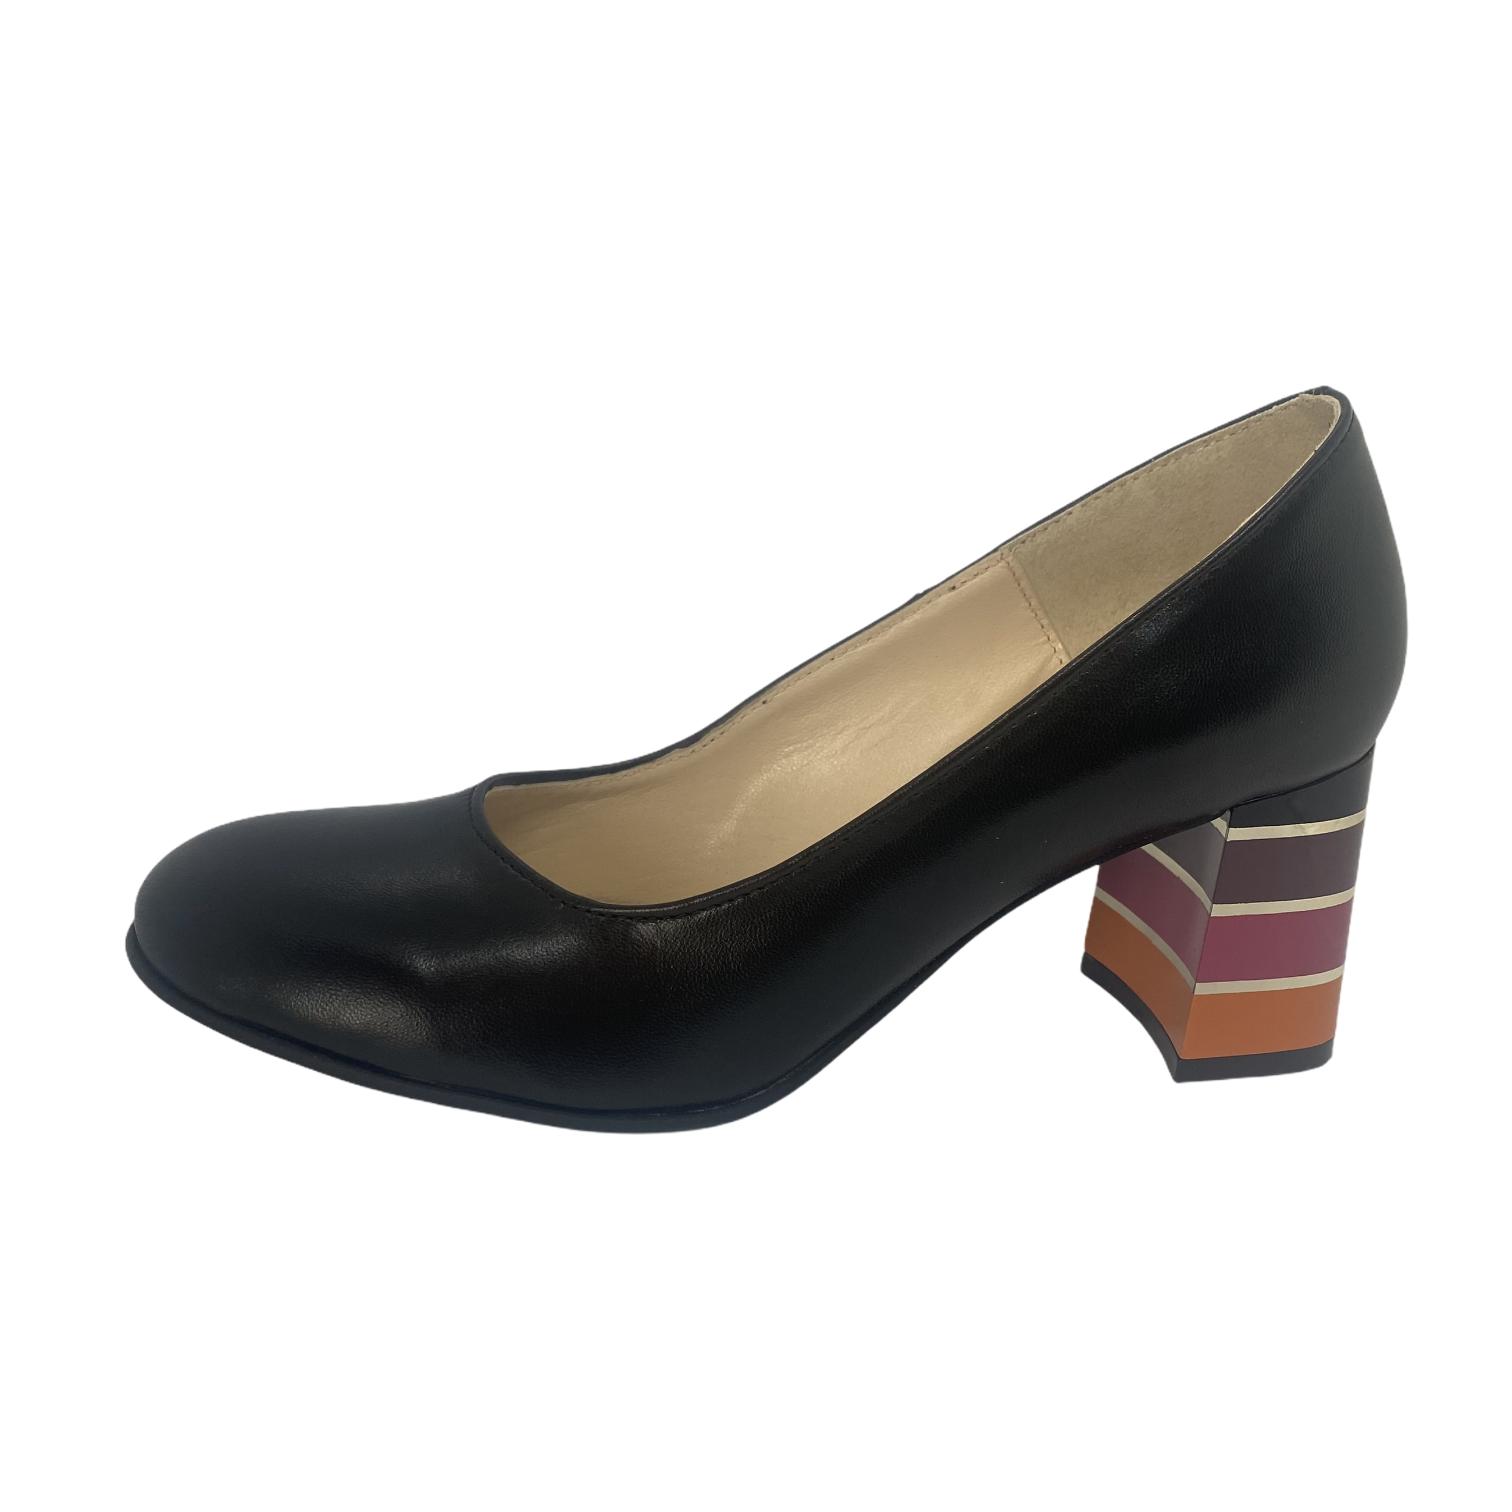 Pantofi negri box cu toc colorat in dungi